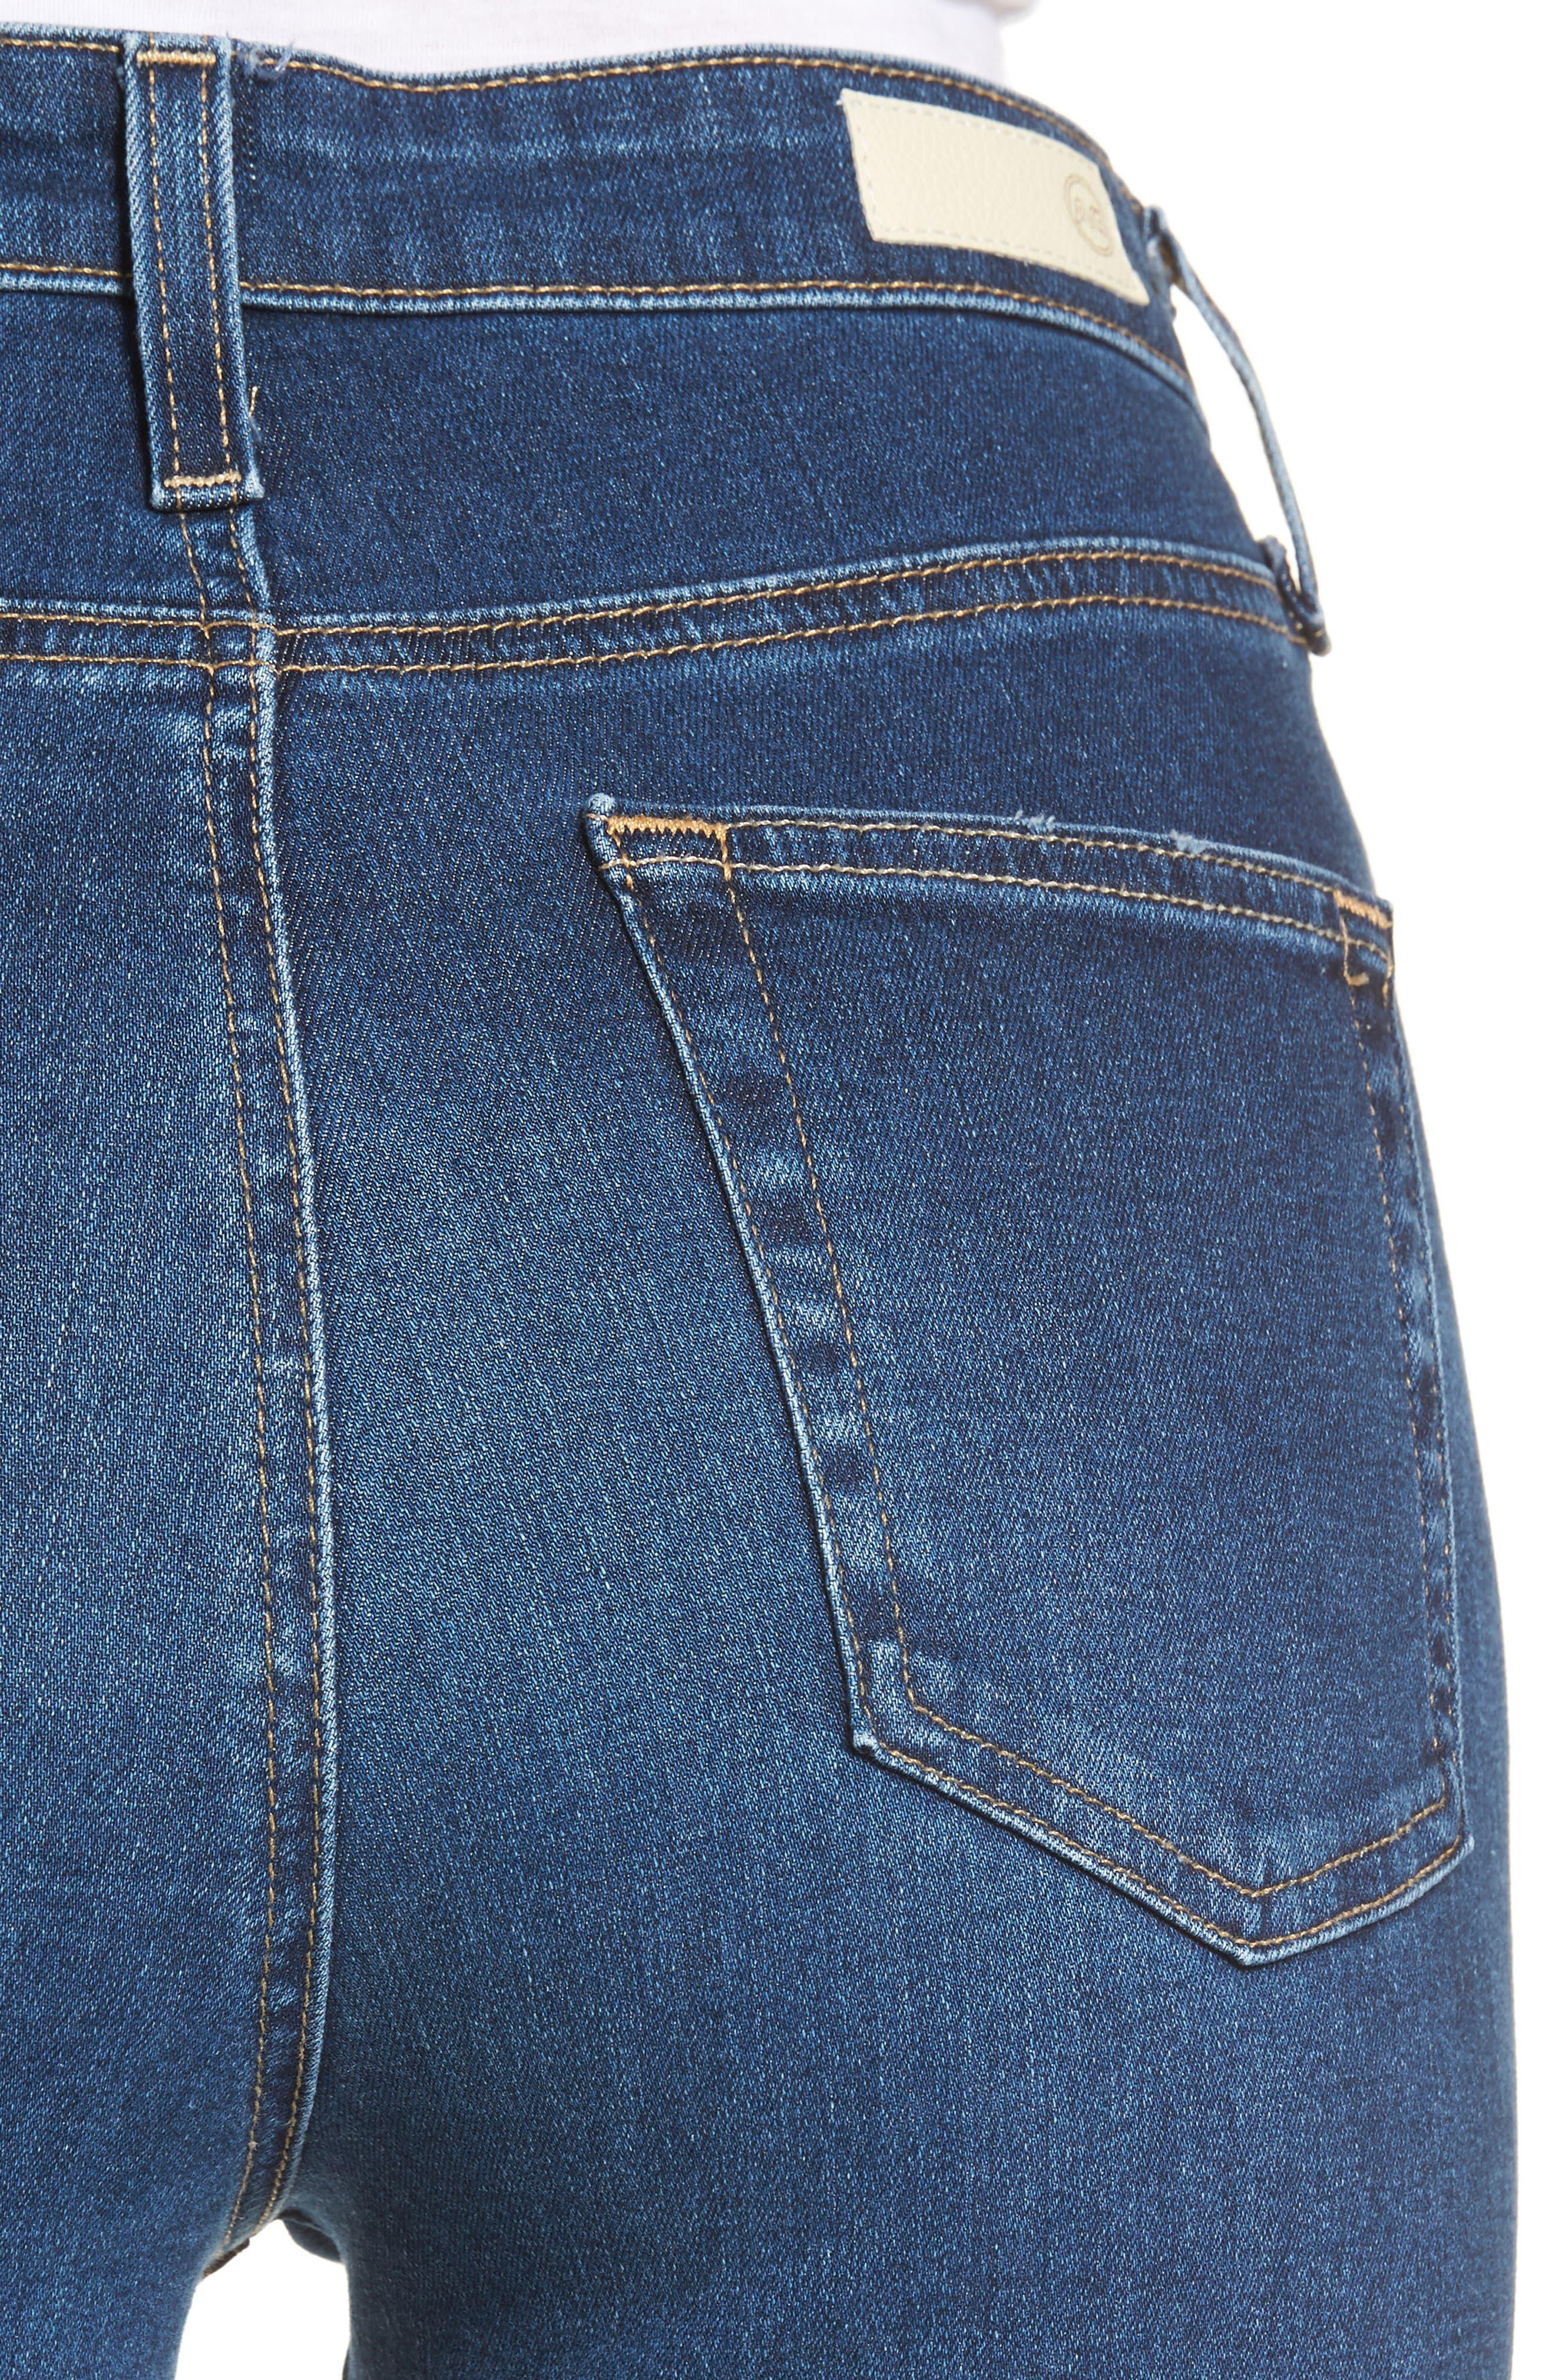 Mila High Waist Skinny Jeans,                             Alternate thumbnail 4, color,                             473